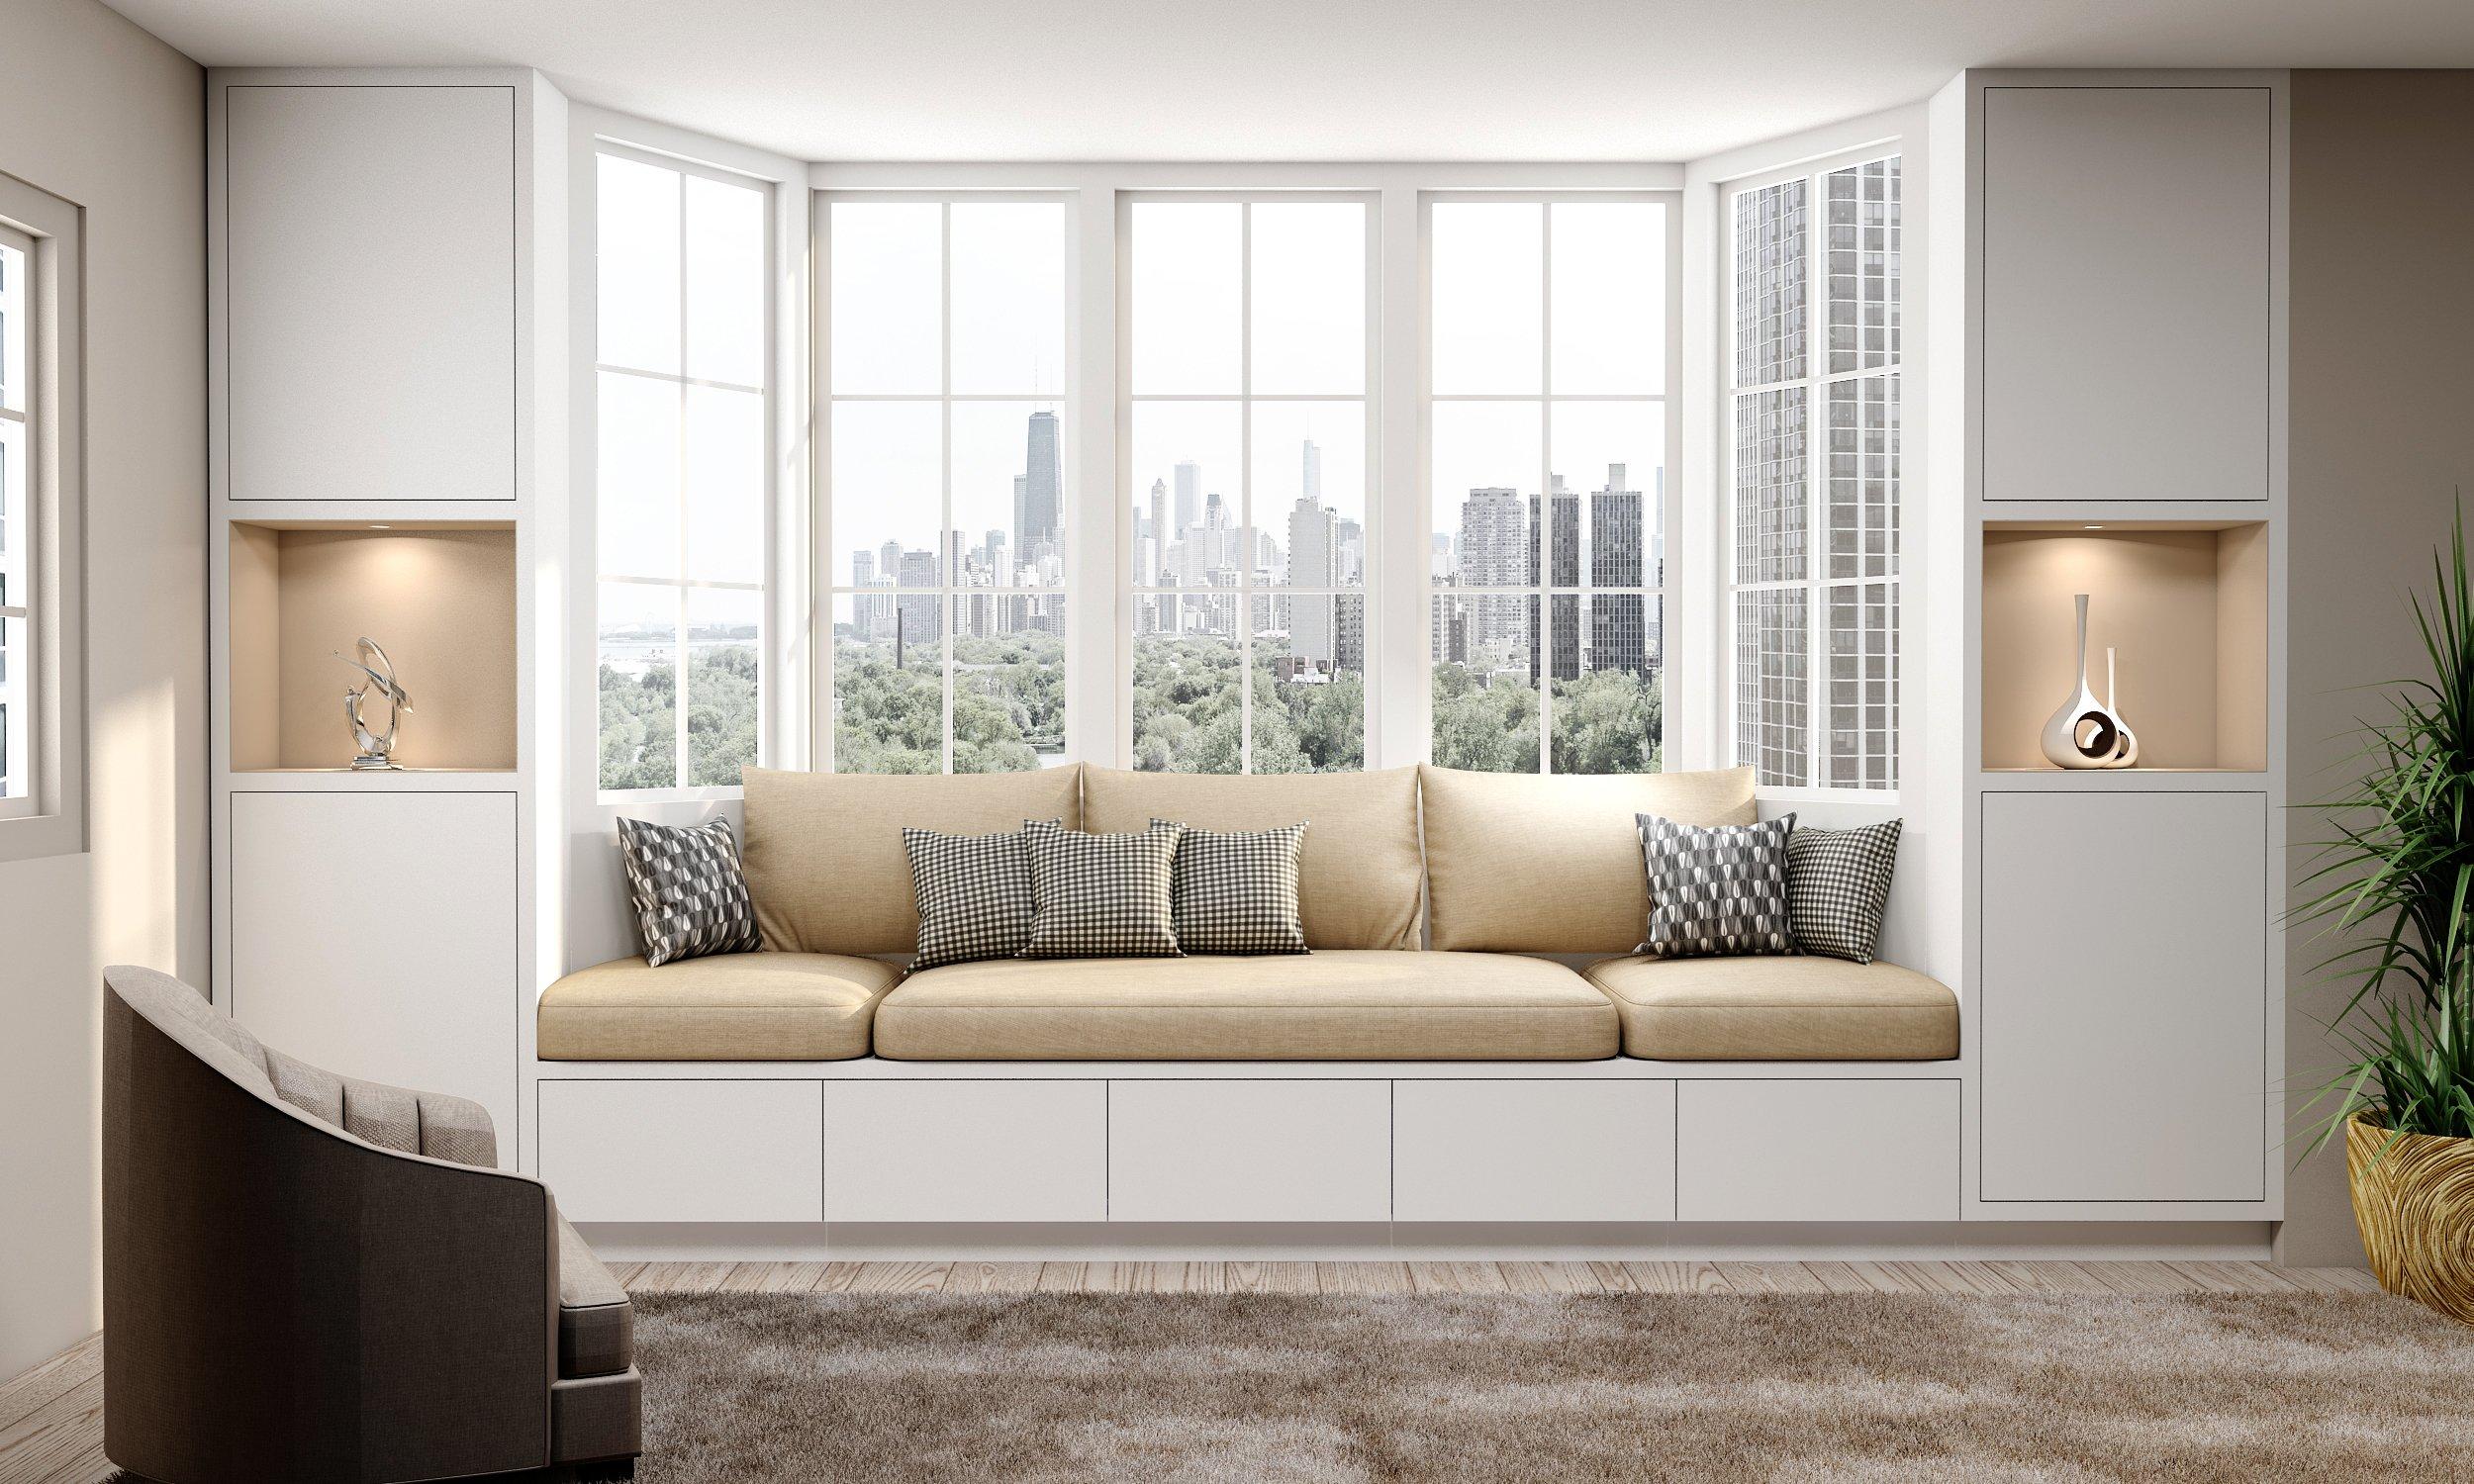 Bay Window sitting cabinets Glacier-White & Cashmere_grey _cushion_36mm frame-1 (1)